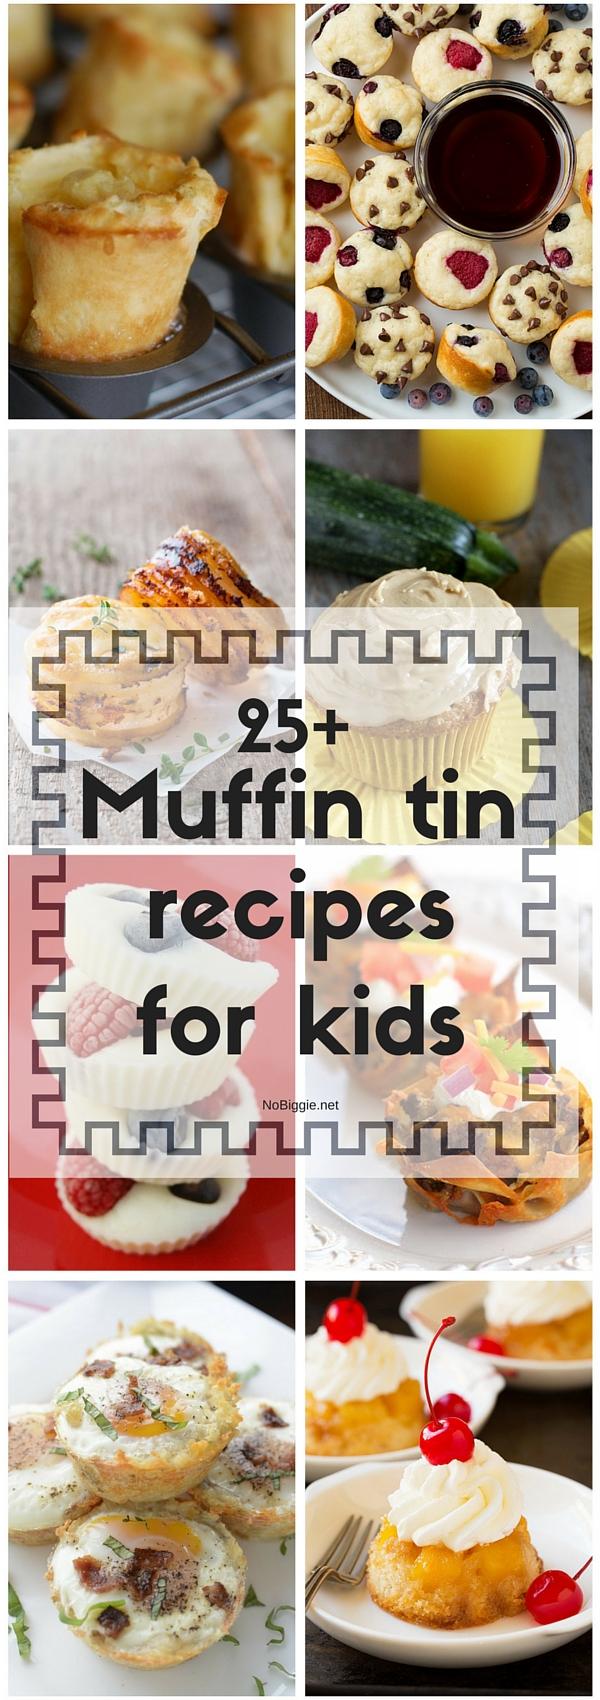 25+ Muffin Tin Recipes For Kids | NoBiggie.net